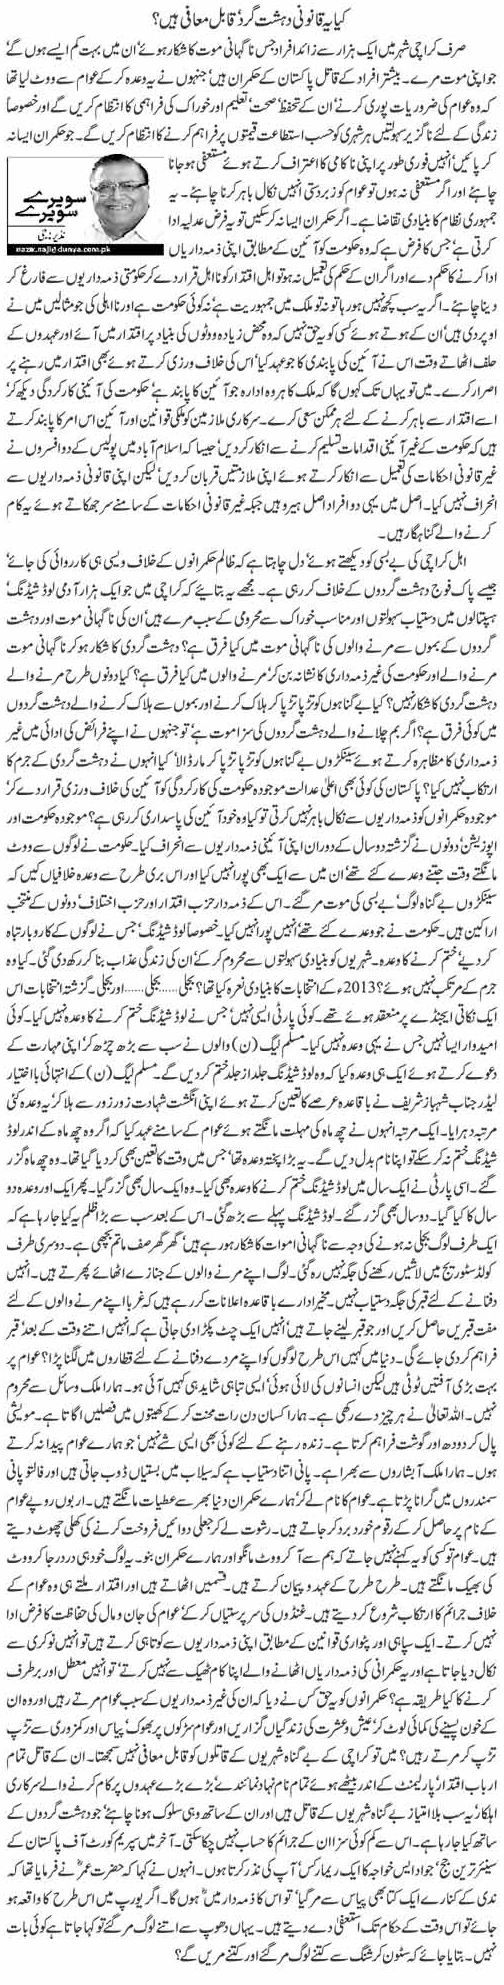 Nazir Naji Column | Kia Yeh Qanoni Dehshatgard Qabile Maafi Hen? | Sawere Sawere